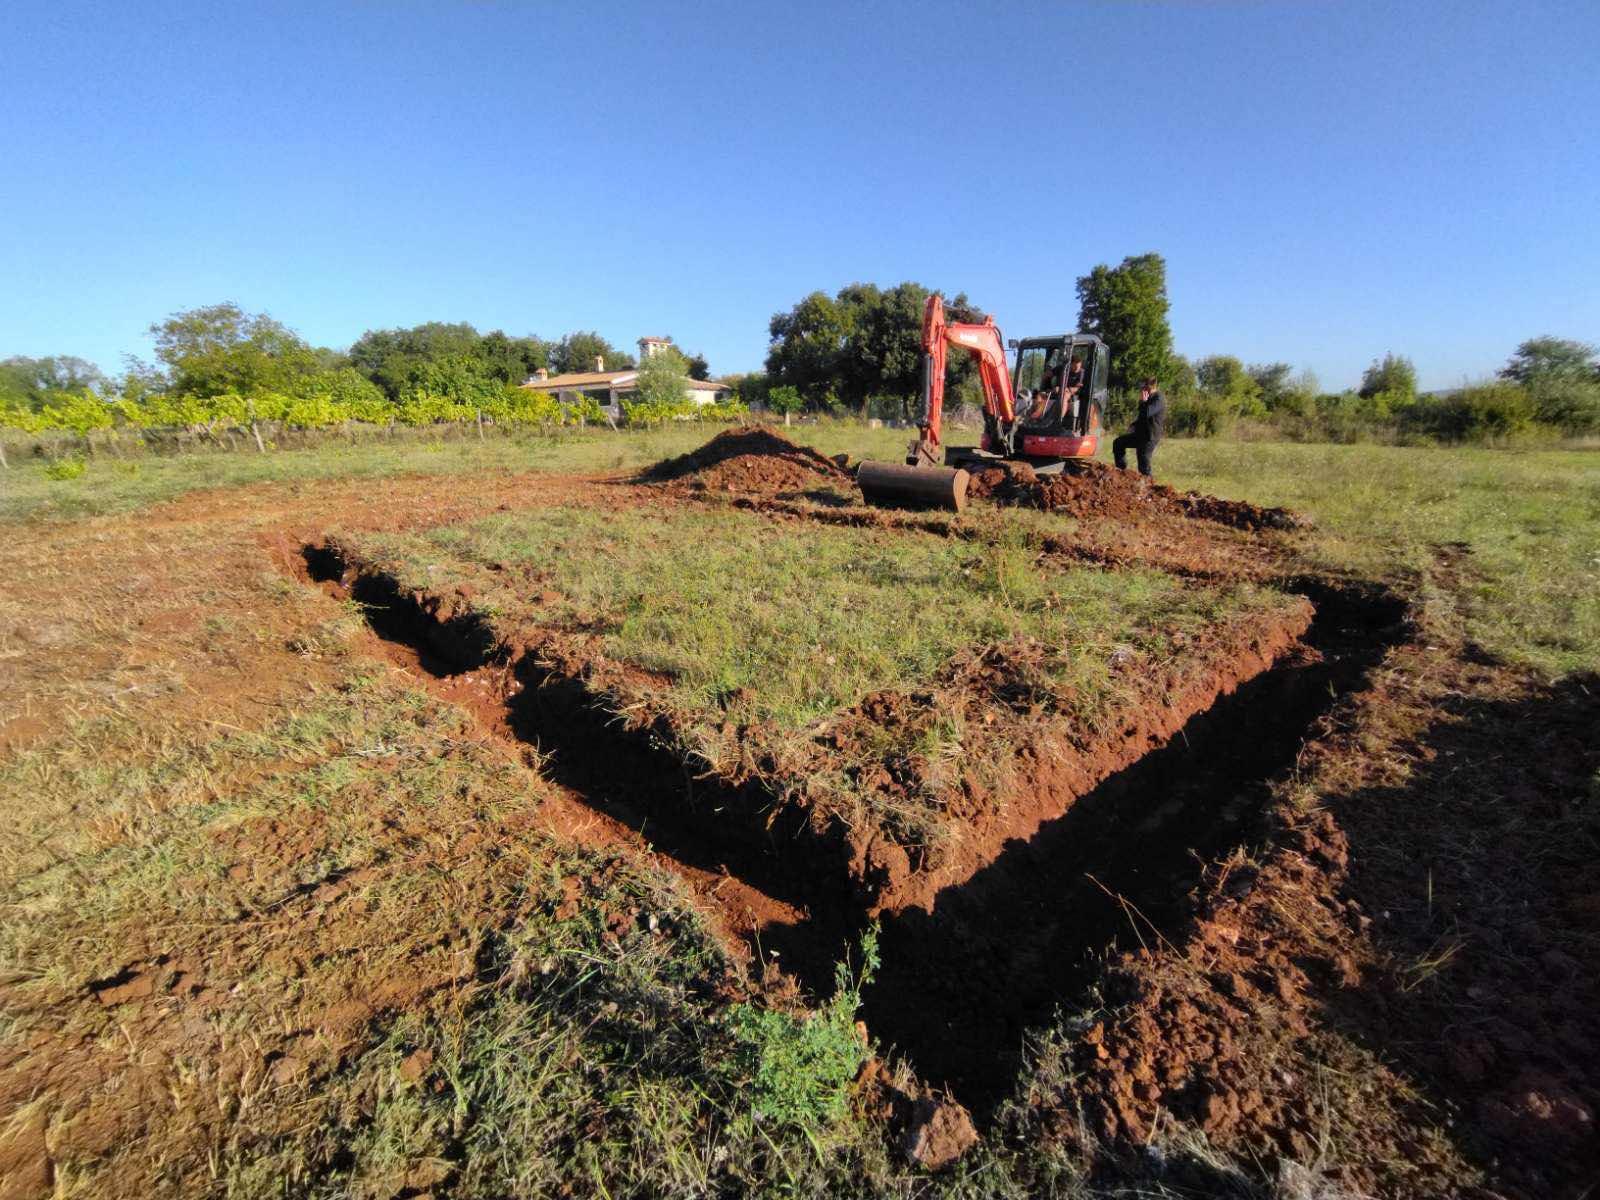 Komunalni redari zaustavili novi pokušaj bespravne gradnje